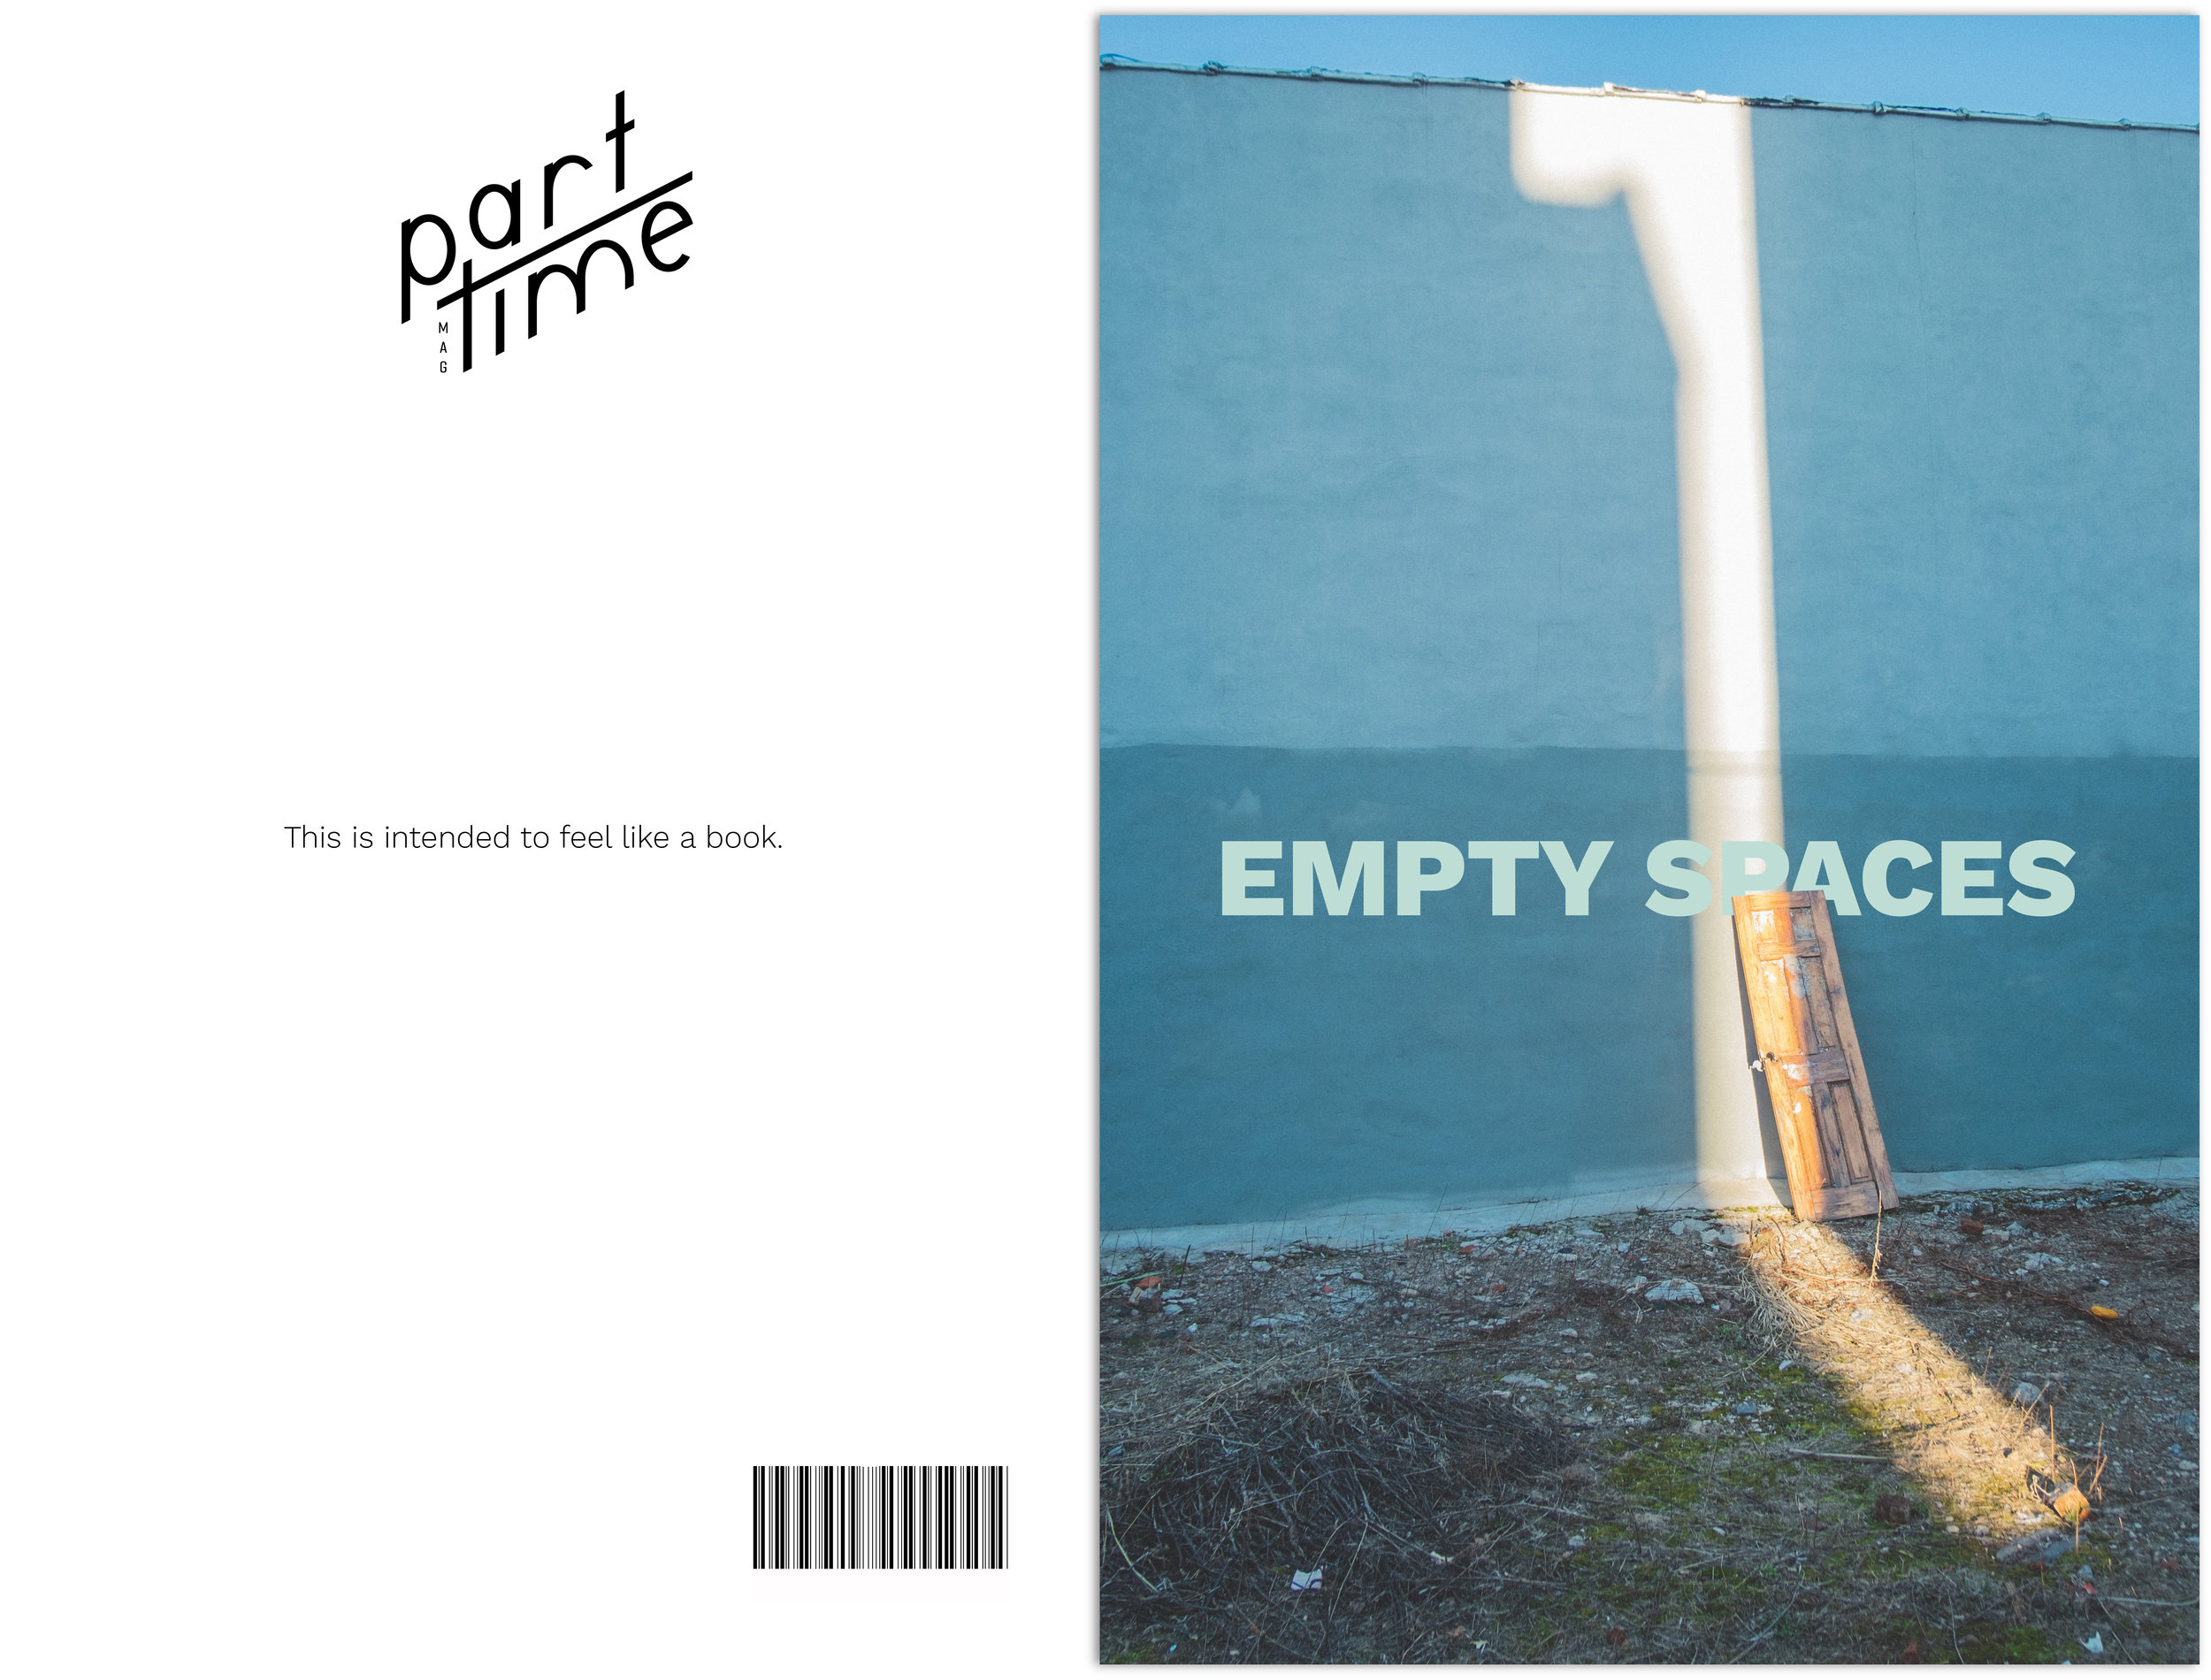 emptyspacescovermyguy.jpg